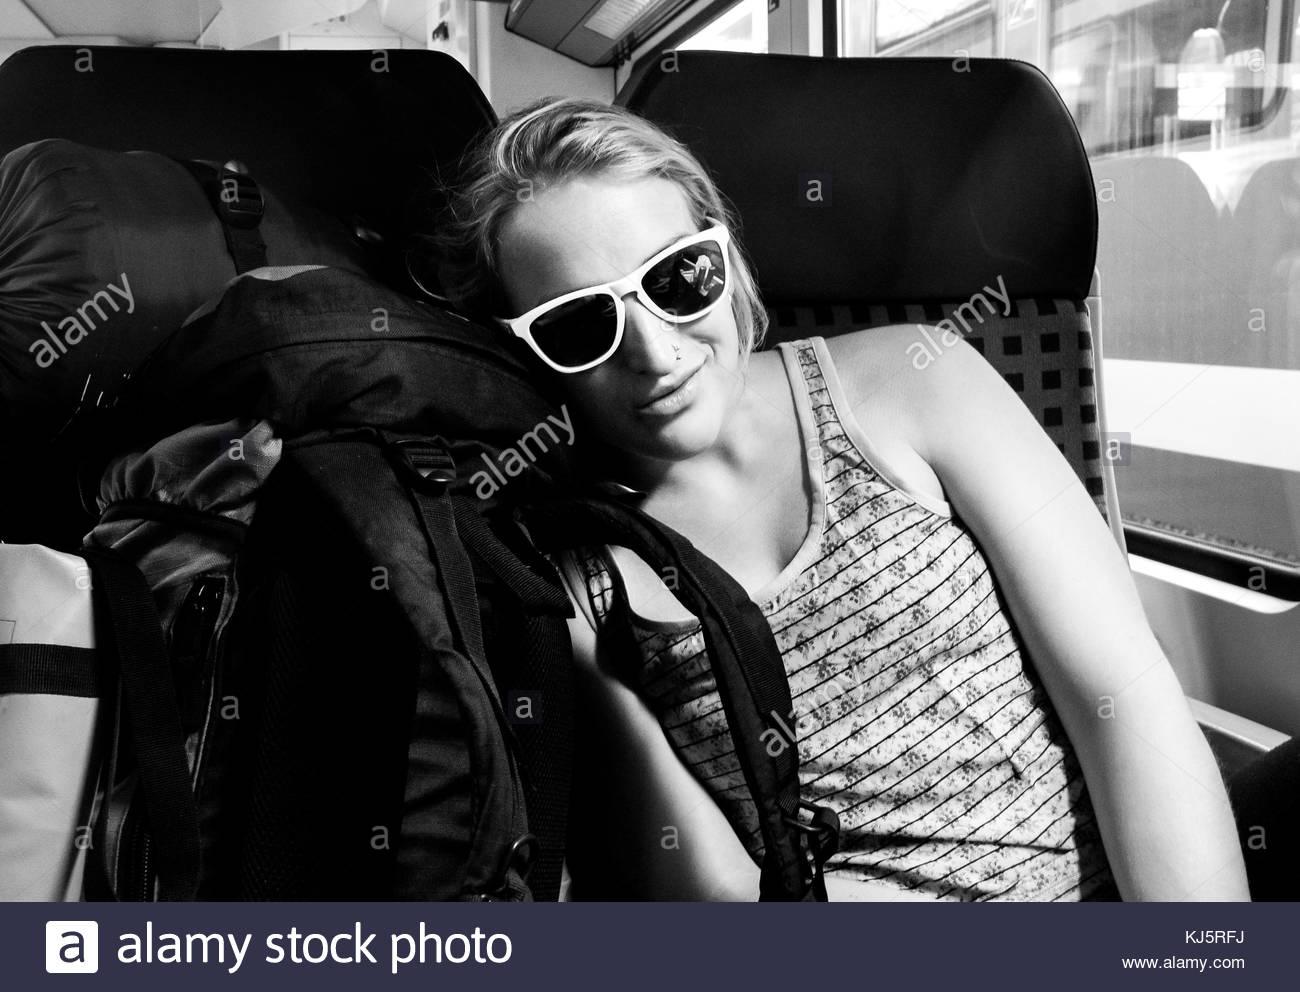 Backpacker femmina sul treno Immagini Stock